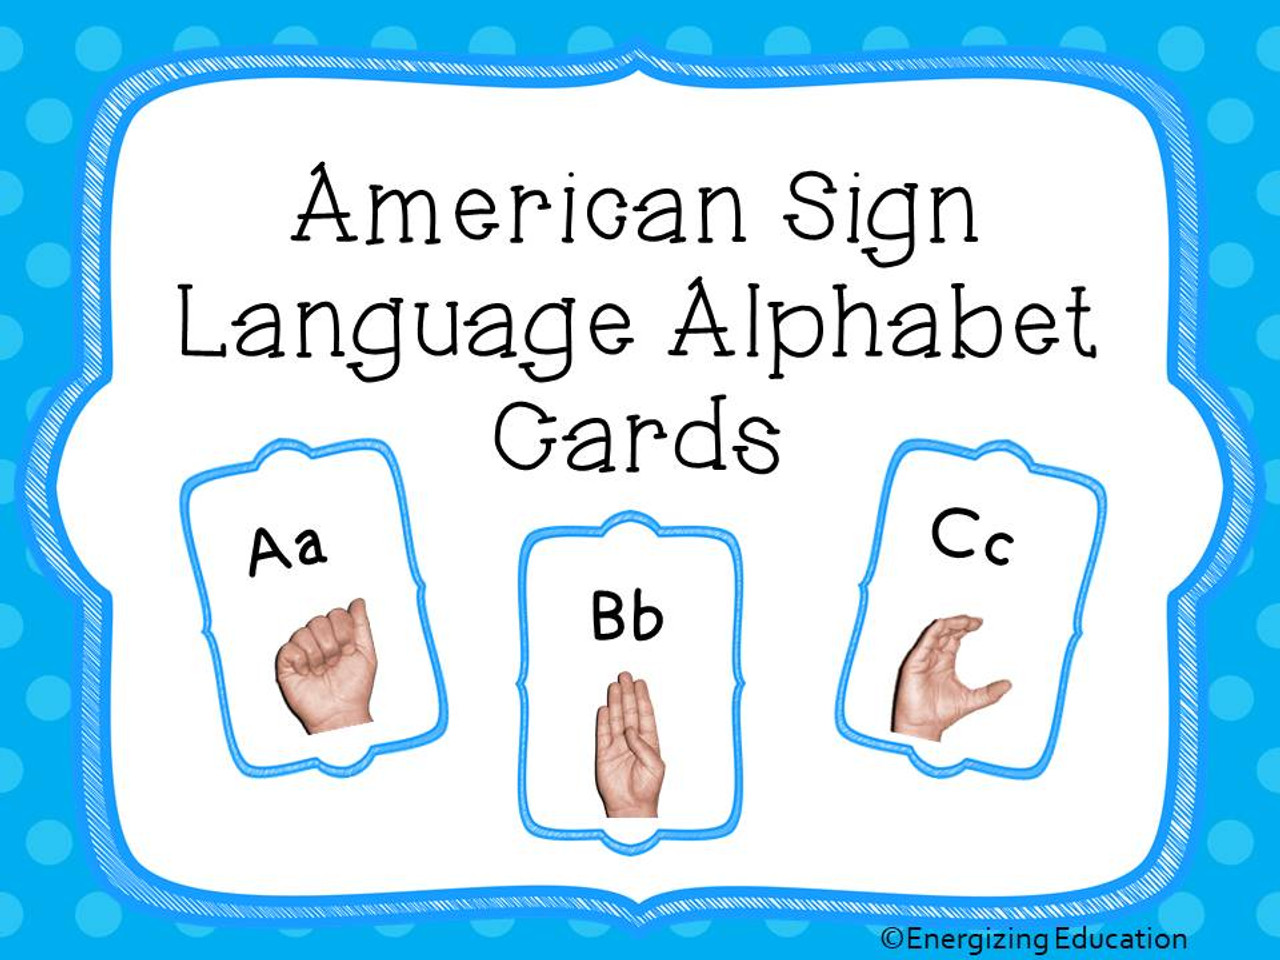 ASL American Sign Language Alphabet Cards